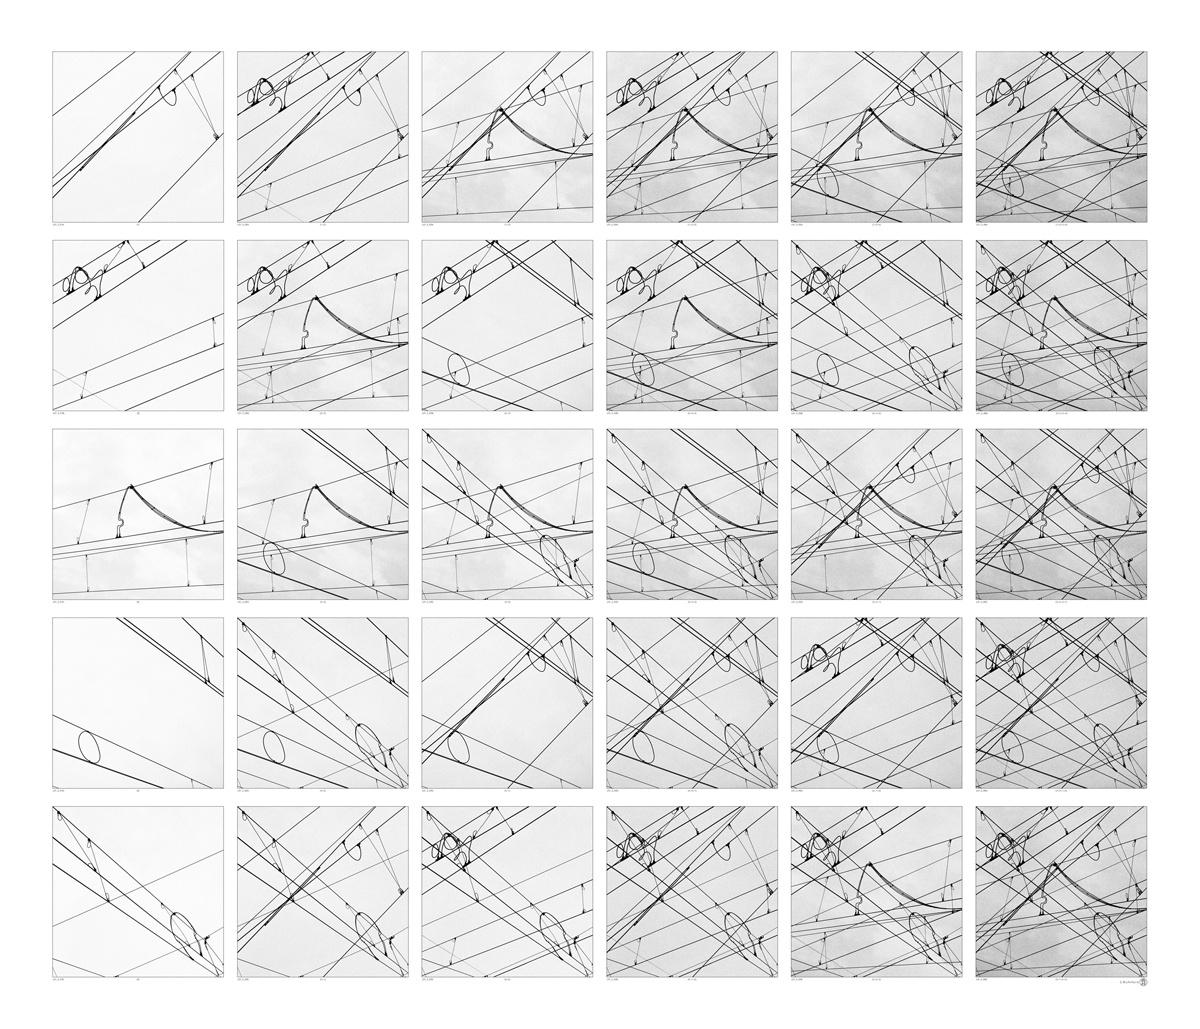 16. Lines 01-3